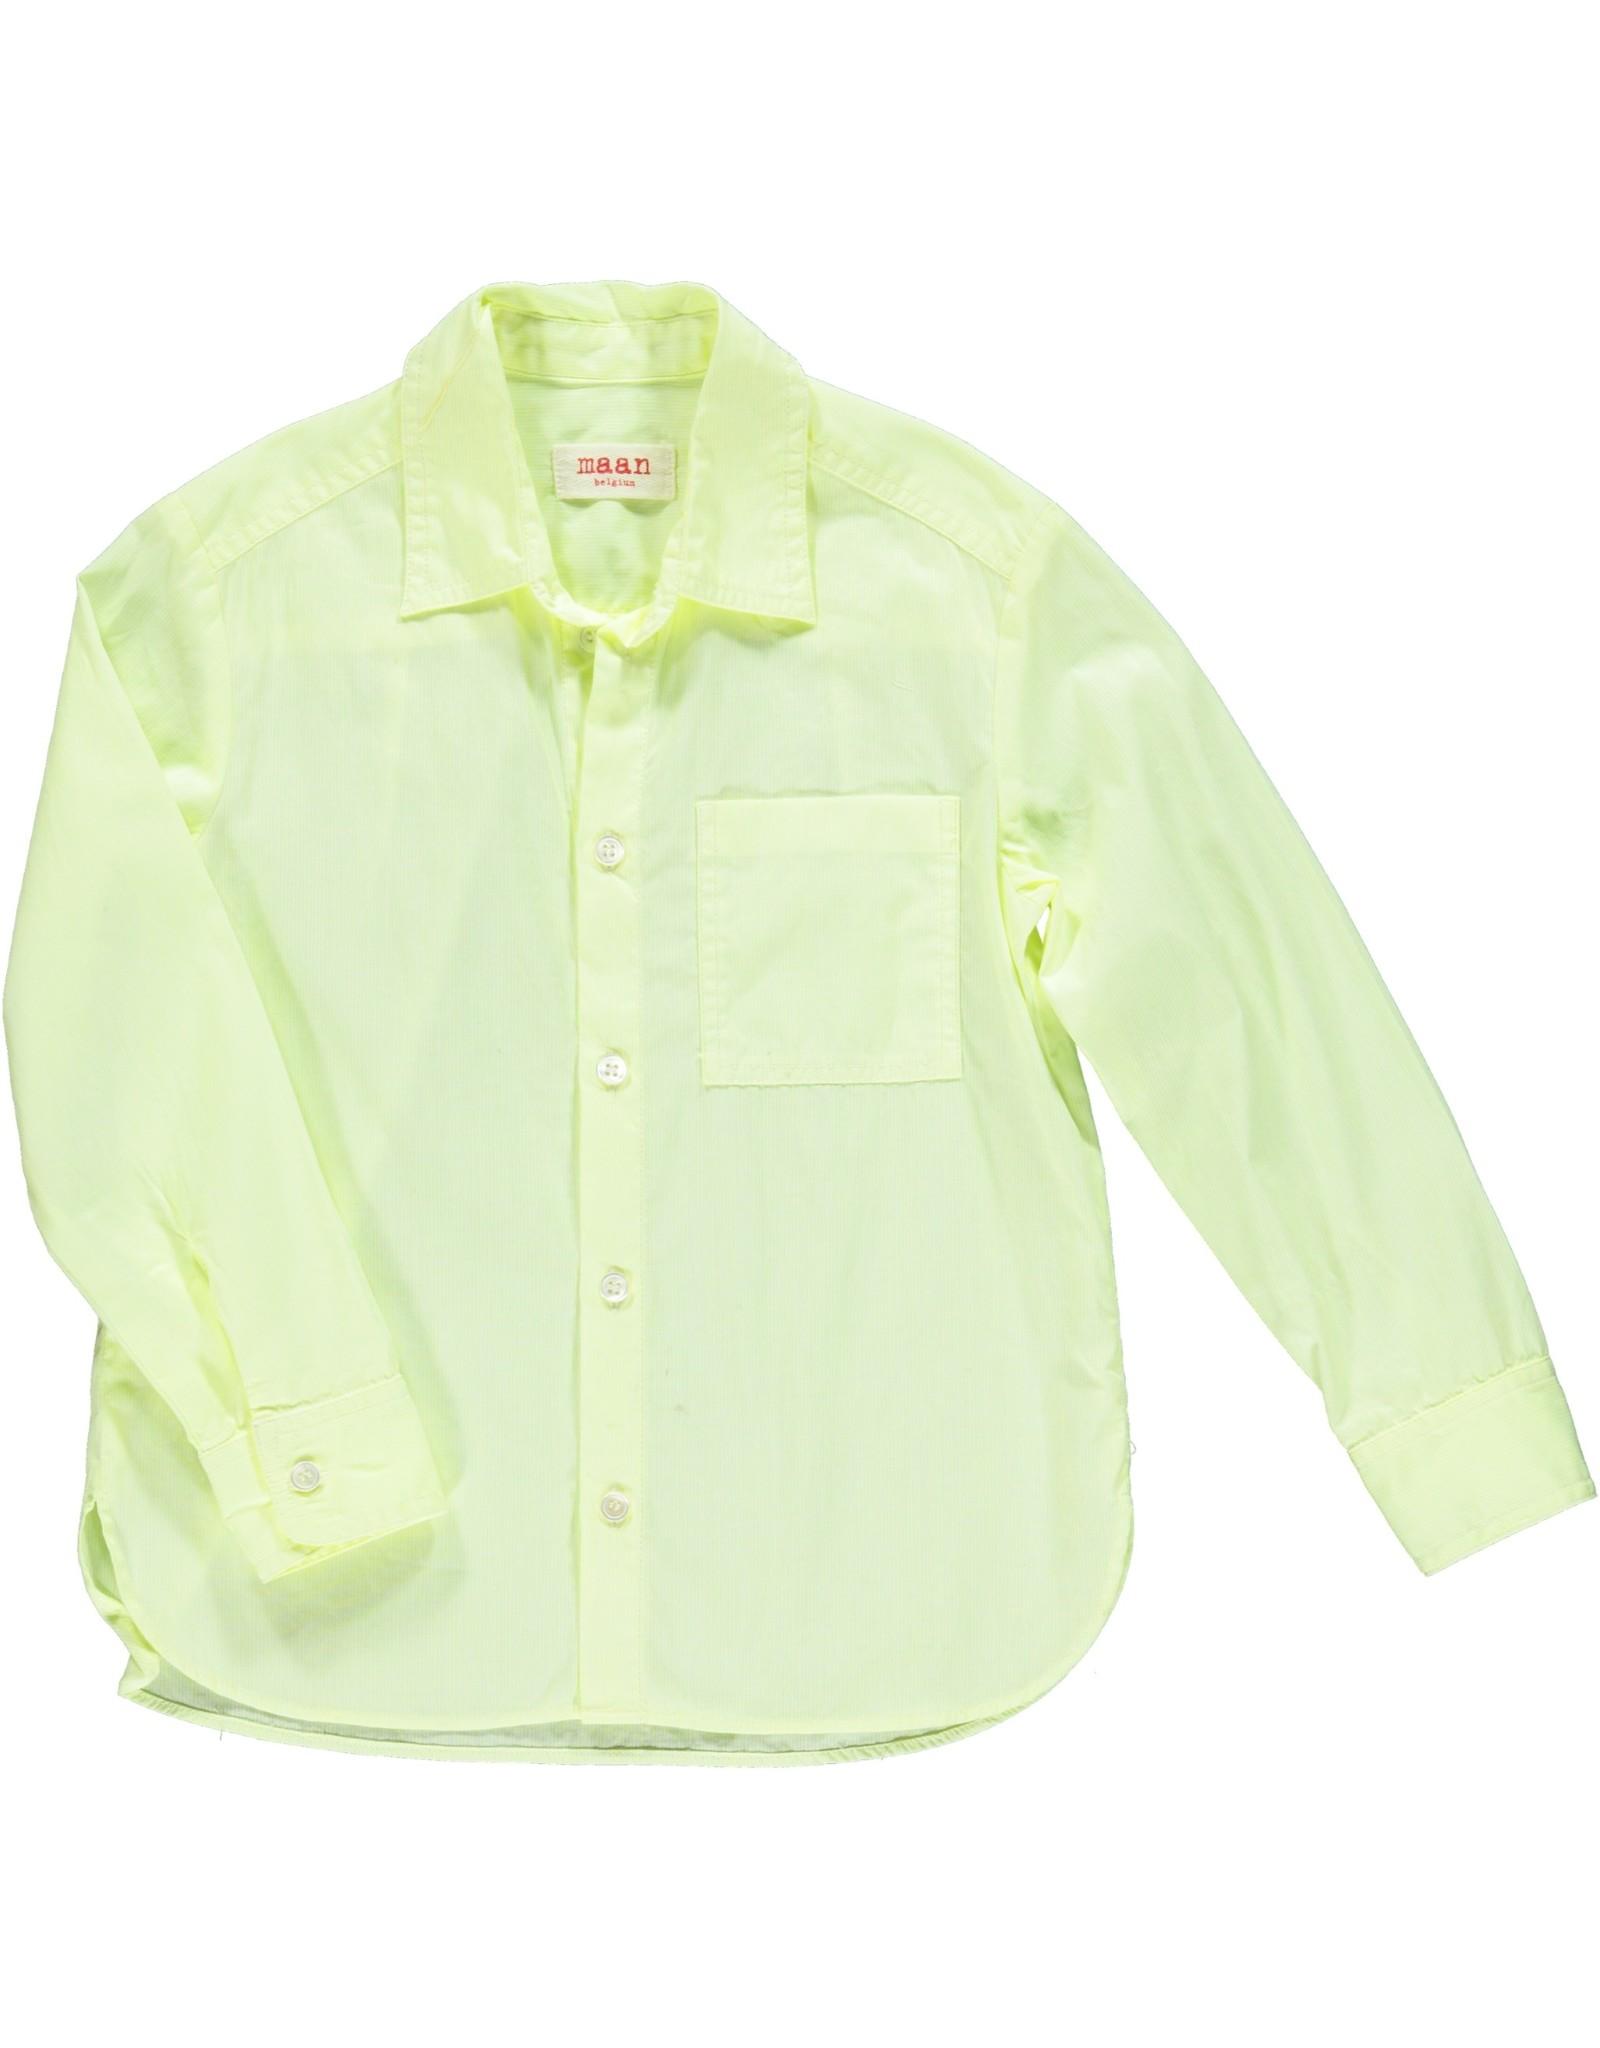 Maan SS21 Funky 23 LS shirt